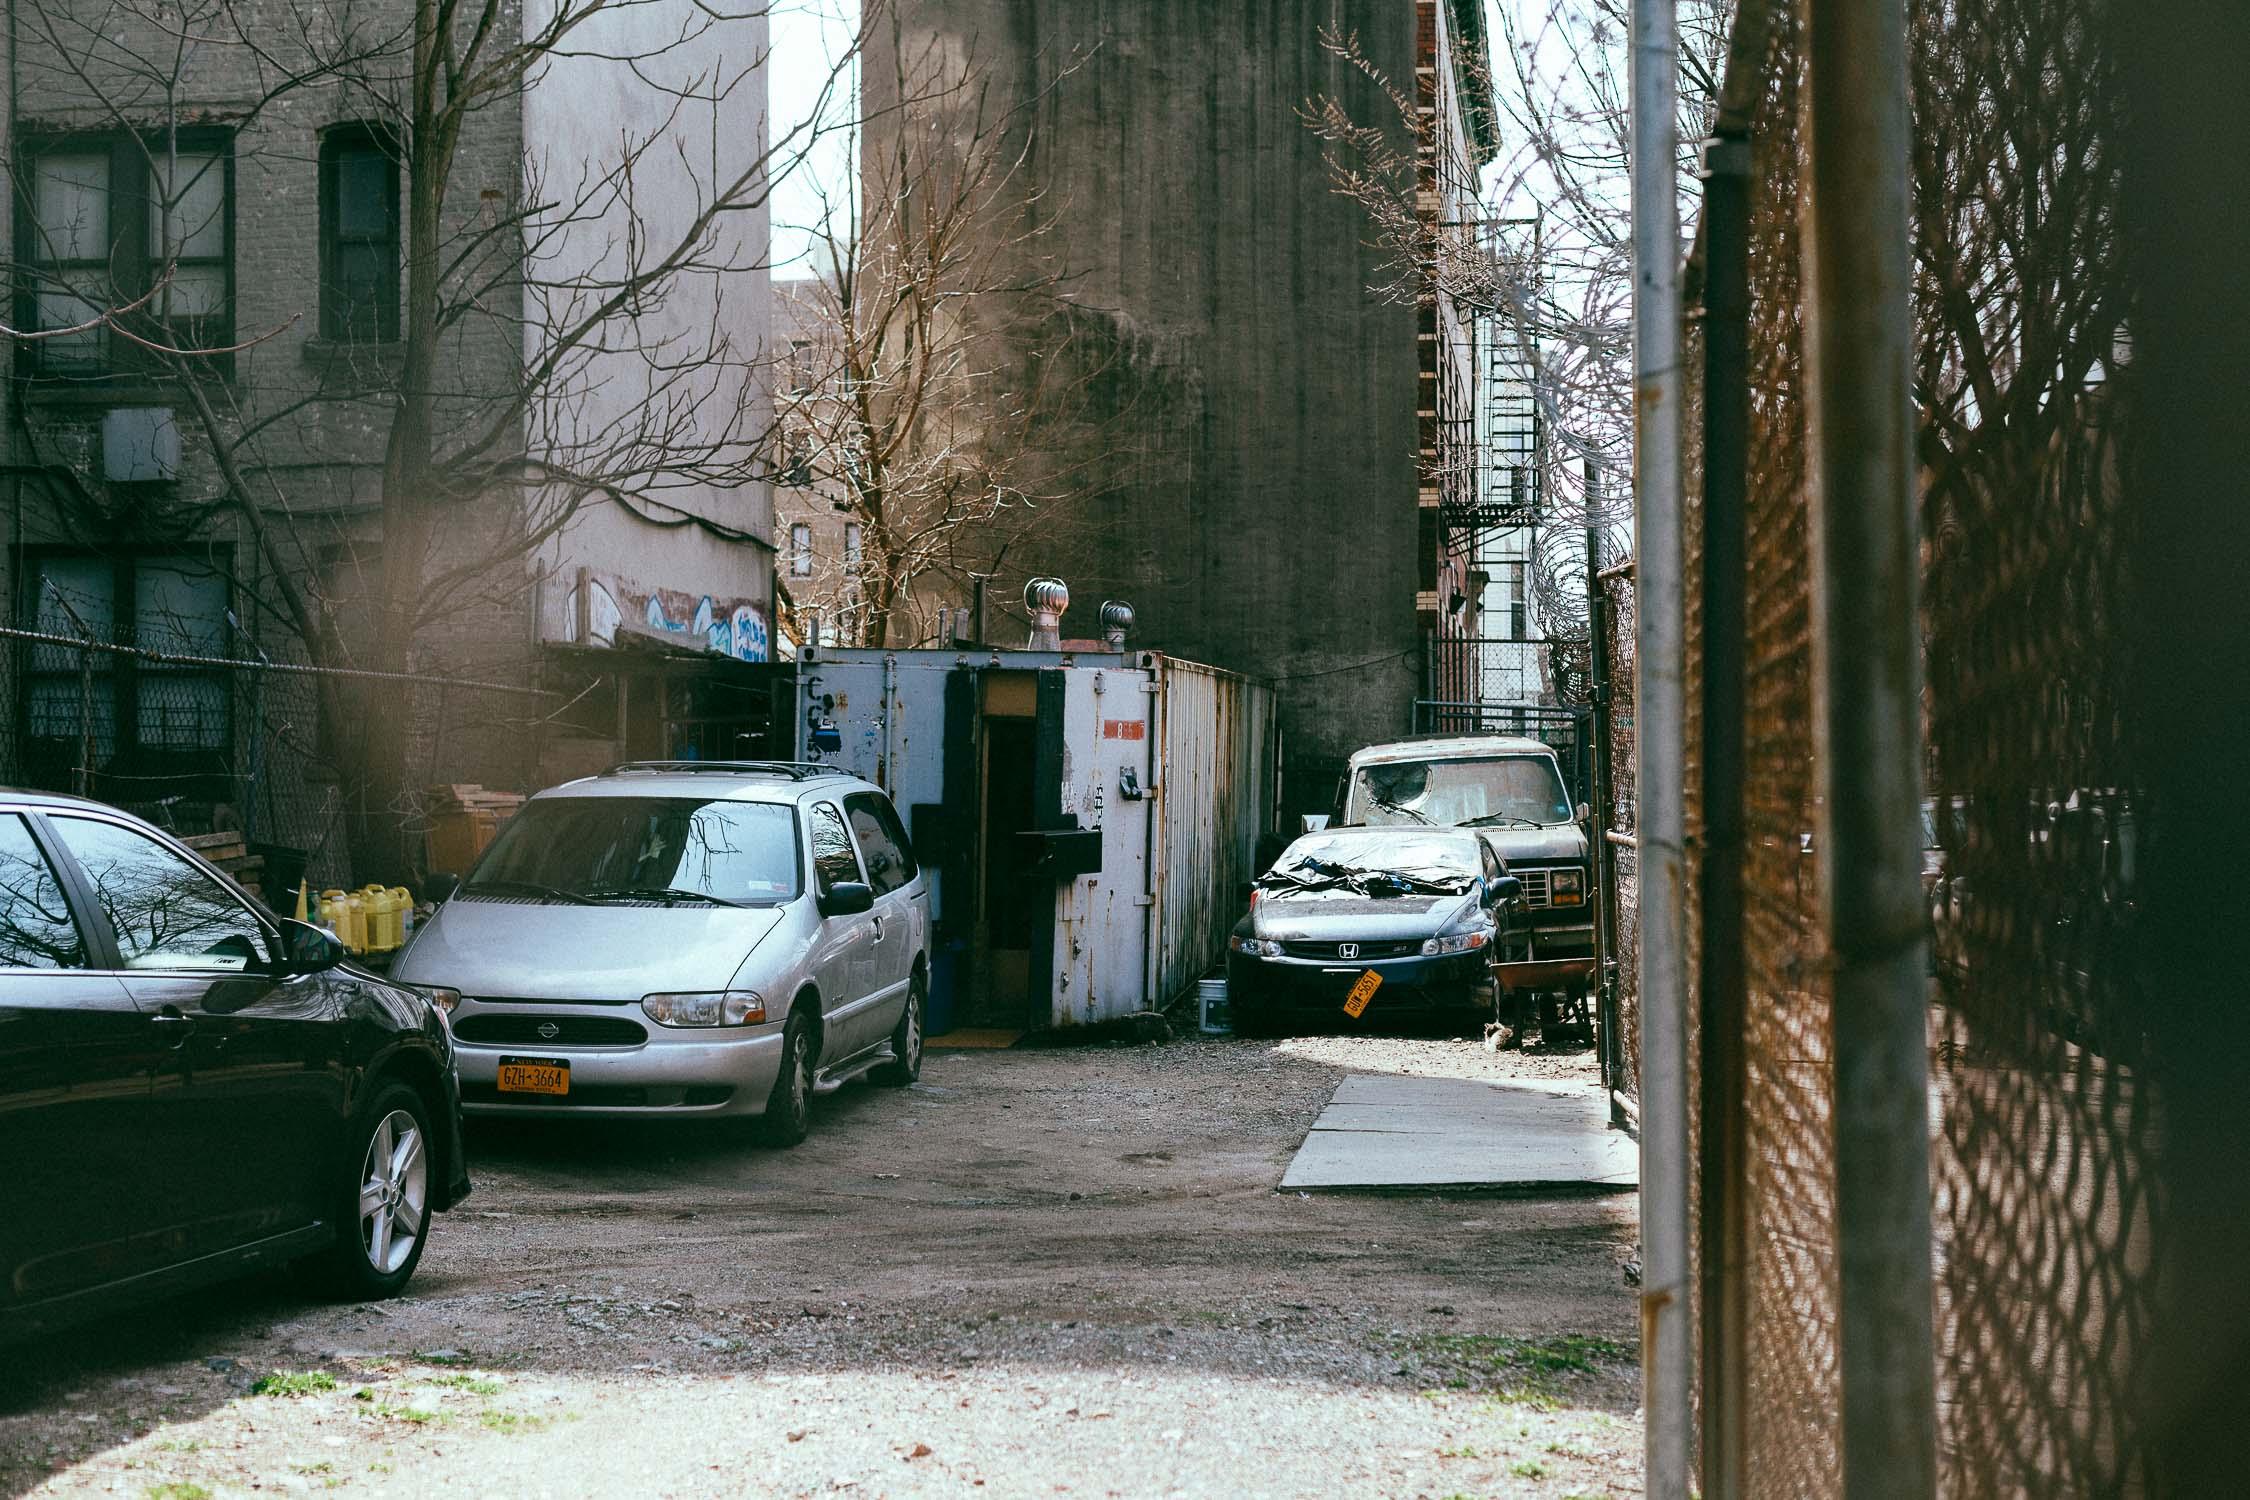 bronx backyard new york exploring street photography